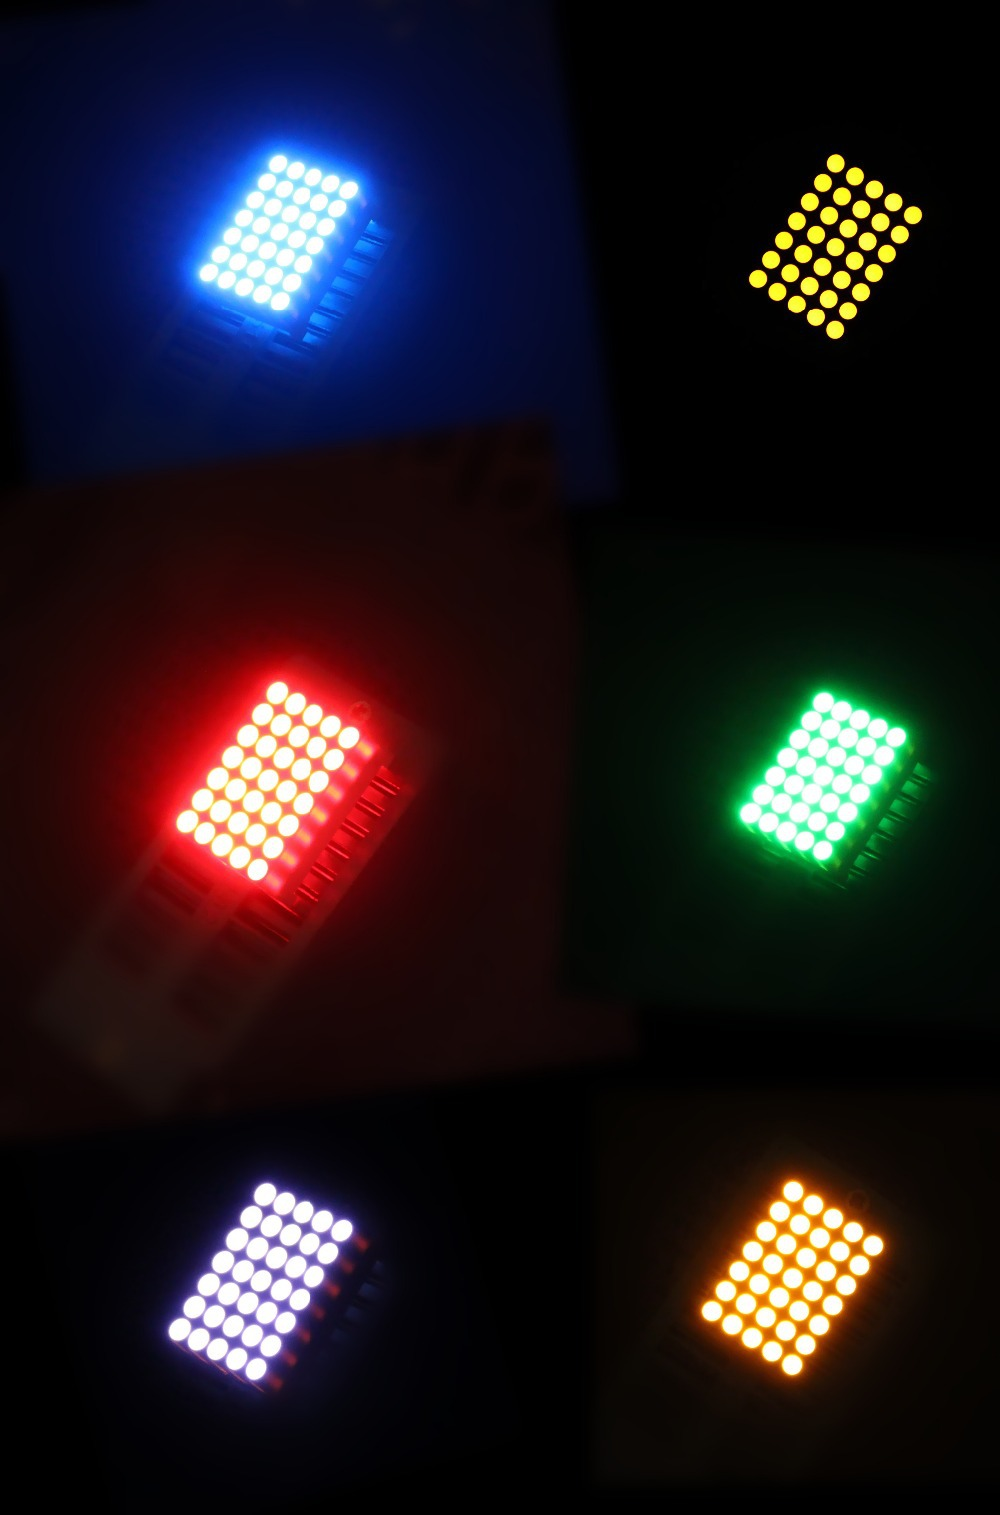 5x7 led dot matrix 3.0mm